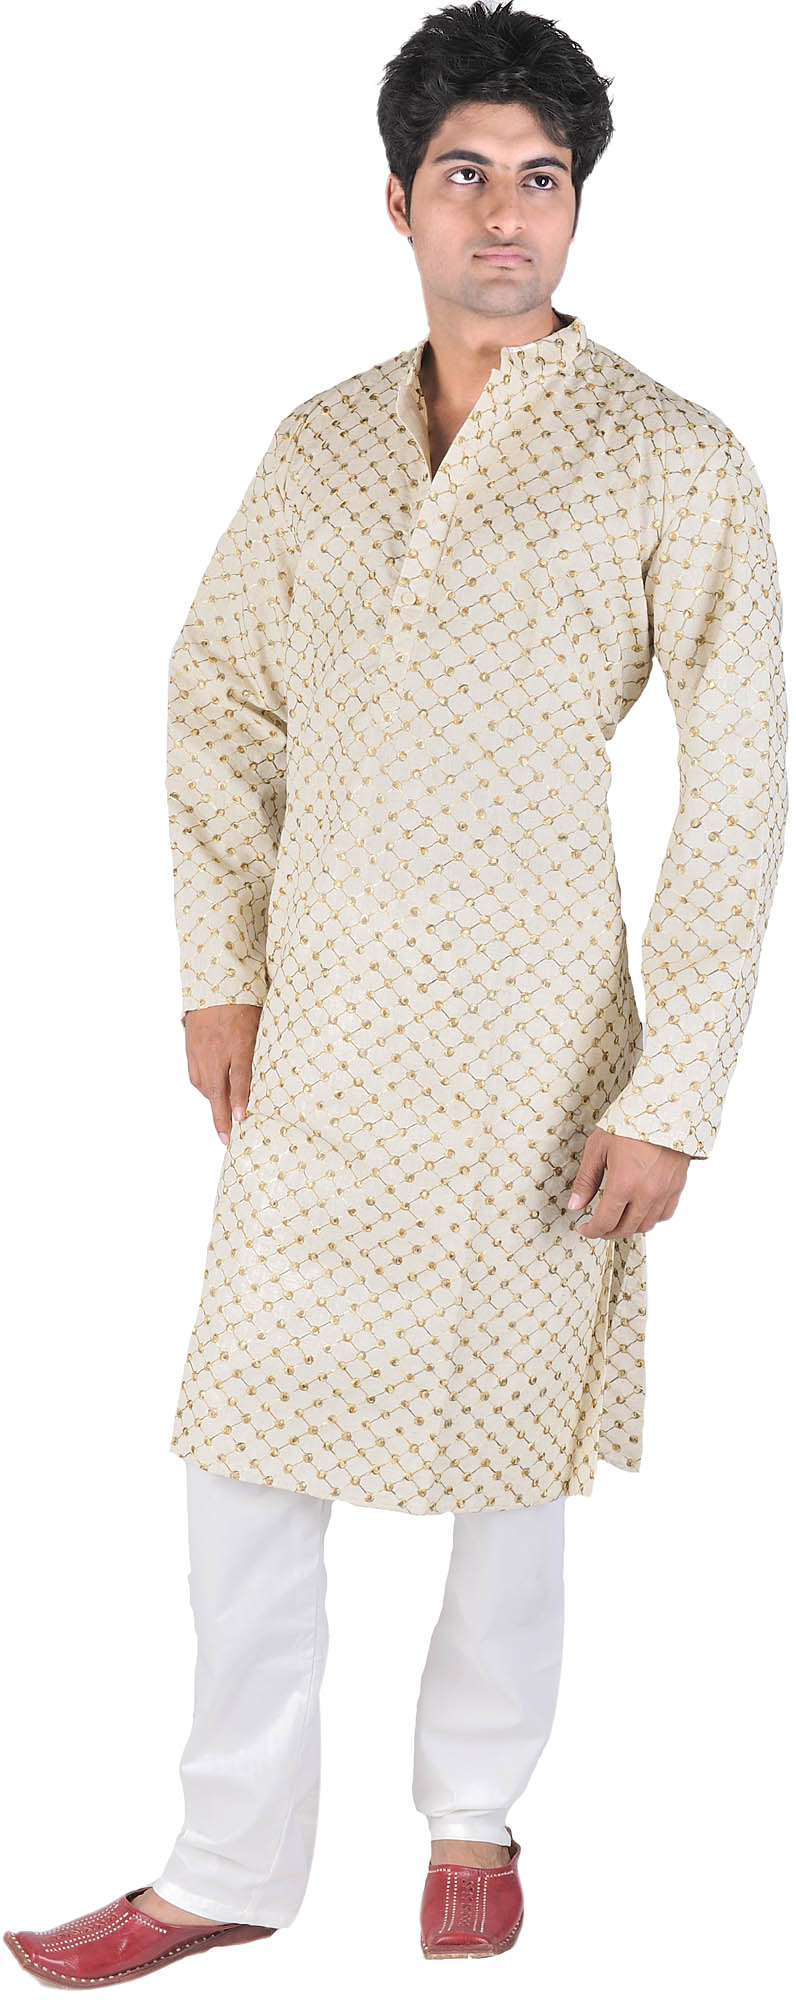 Ivory Kurta Pajama With AllOver Jaal Embroidery